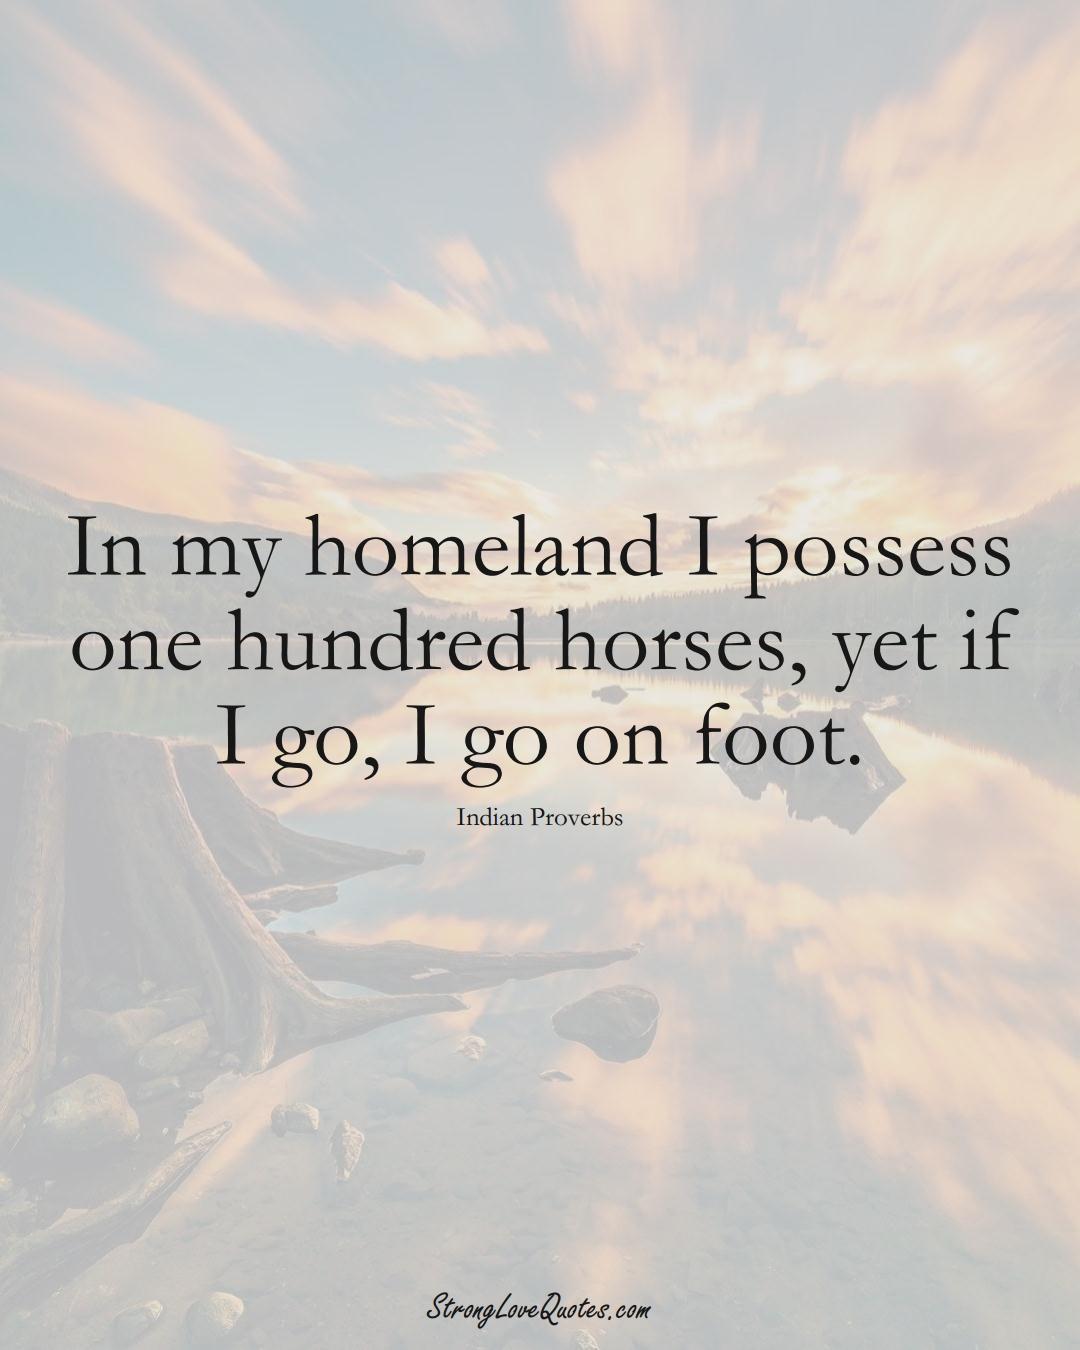 In my homeland I possess one hundred horses, yet if I go, I go on foot. (Indian Sayings);  #AsianSayings